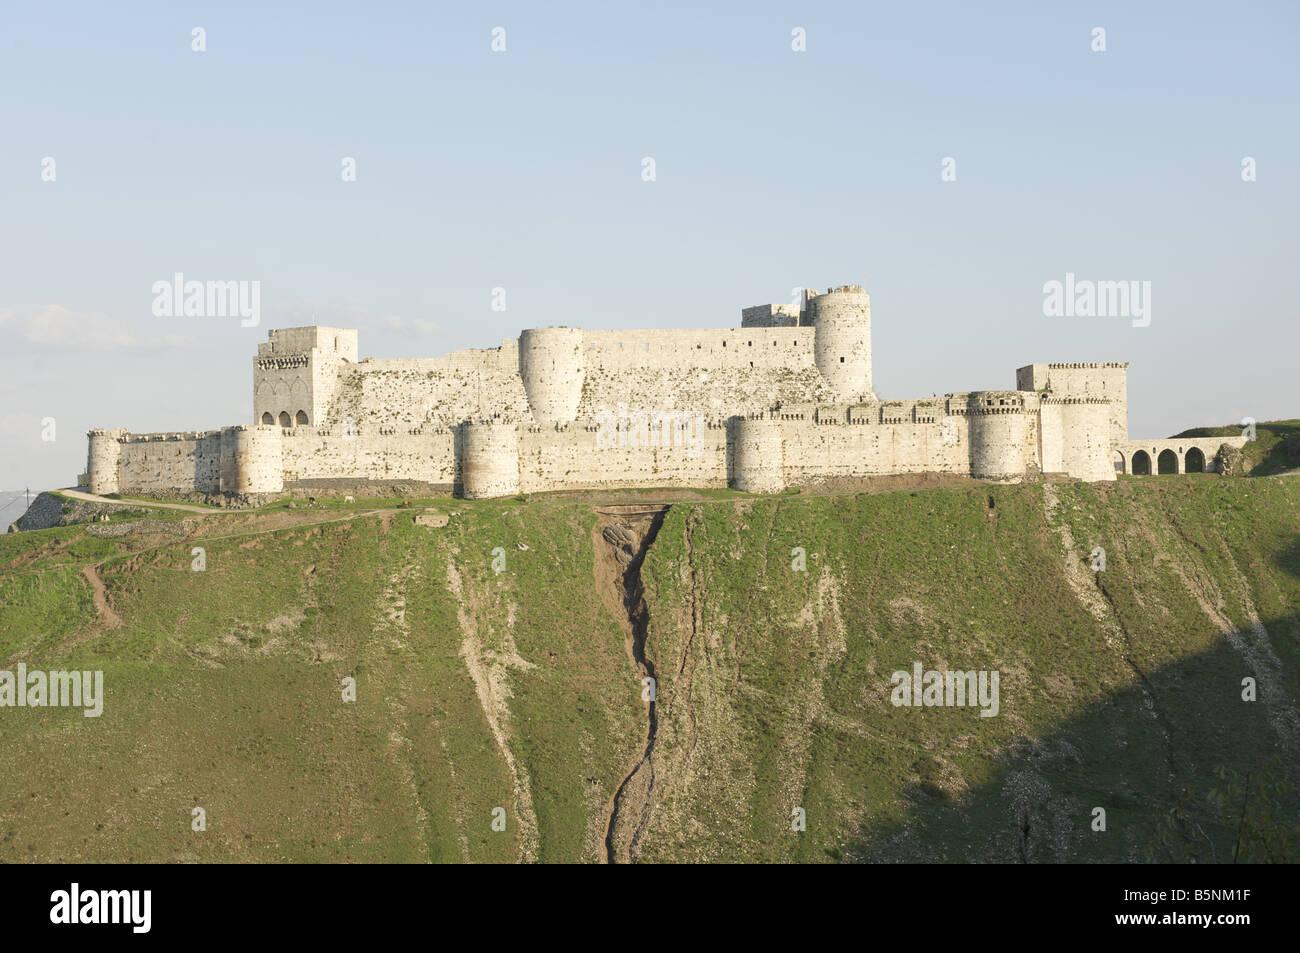 Krak Des Chevaliers, Syria, Qalaat Al Hosn - Stock Image